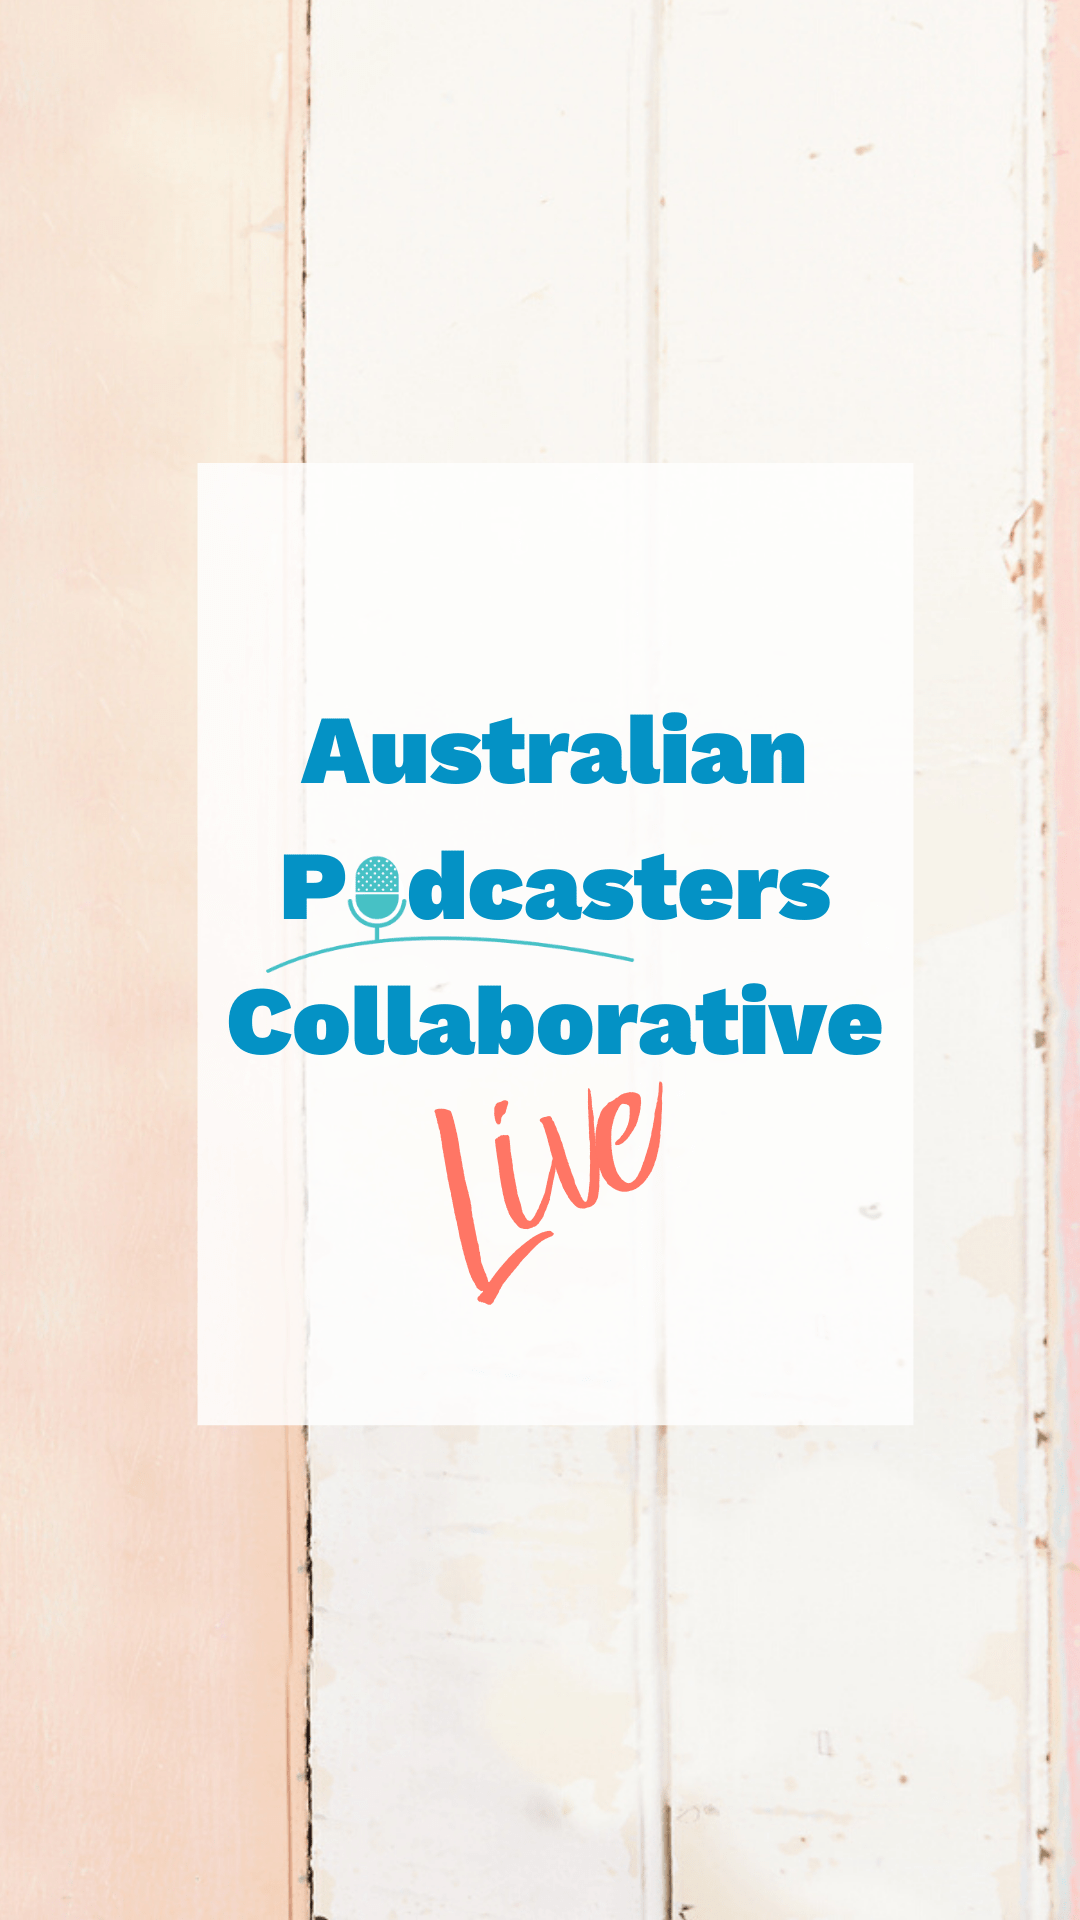 Australian Podcasters Collaborative Live